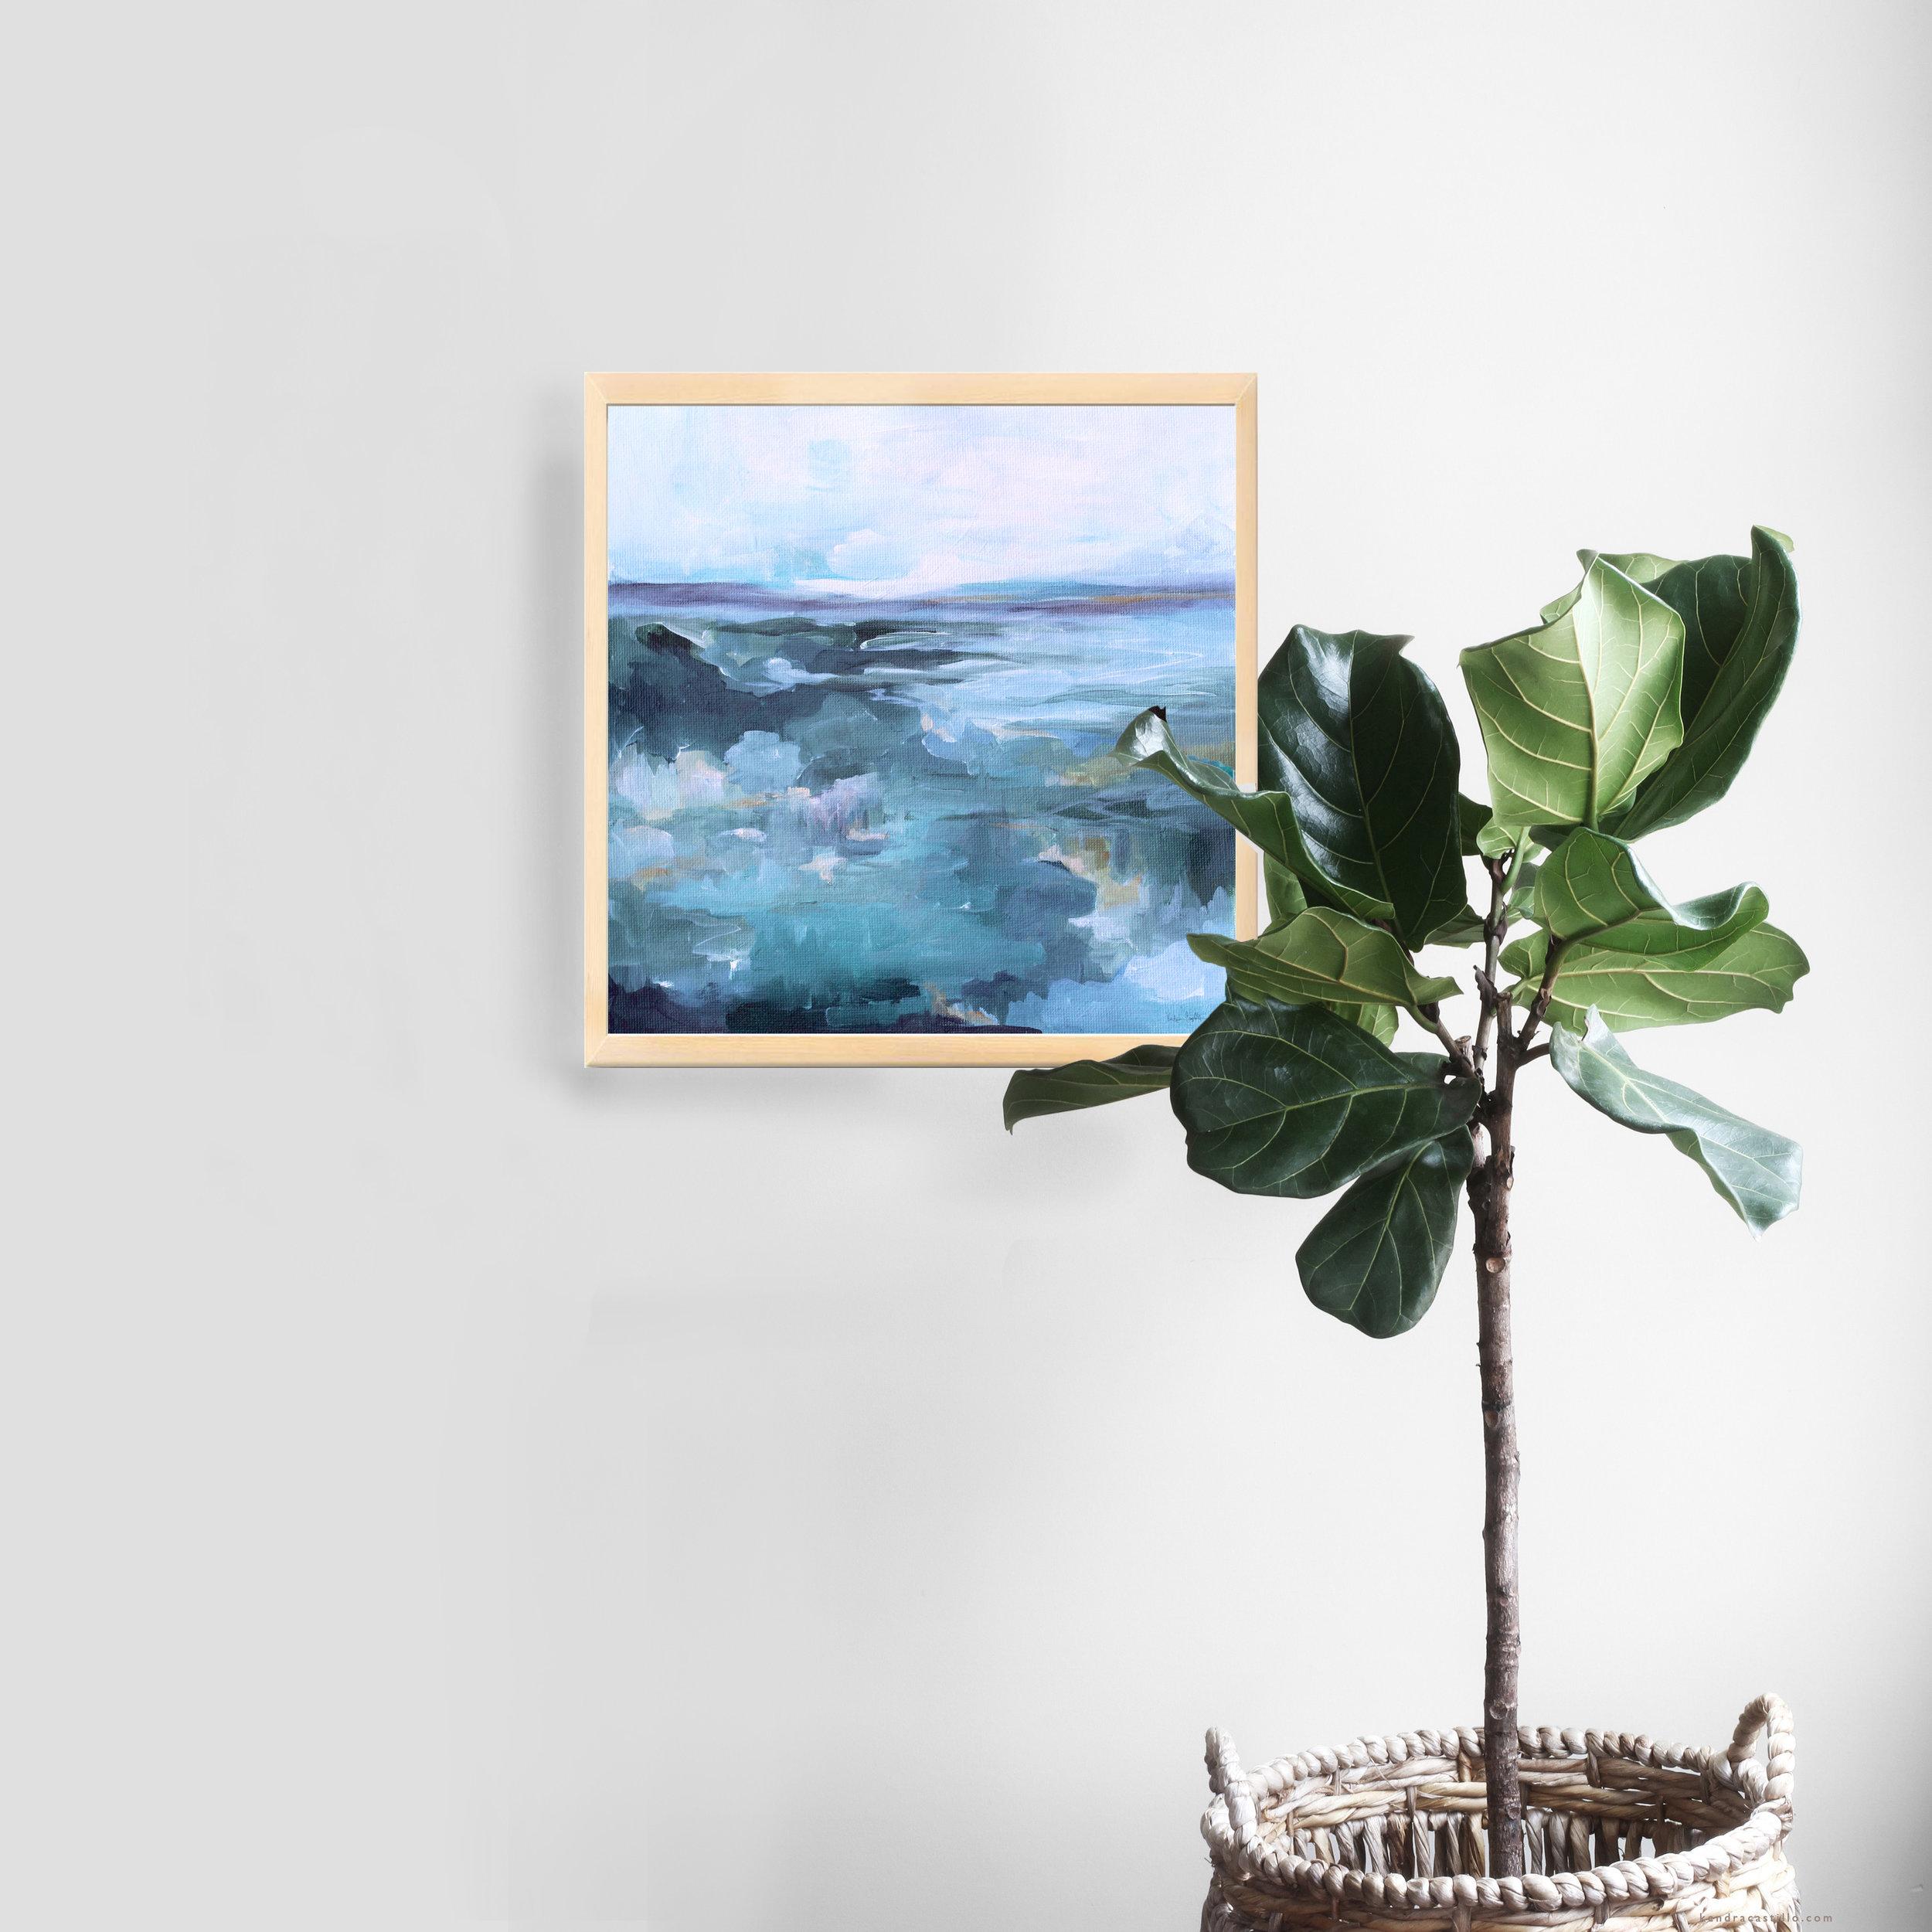 """Reflections"" A fine art print from Kendra Castillo's shop. www.kendracastillo.com #artprint #interiorart #homestyling #fiddleleaf #landscapepainting #abstractlandscape"